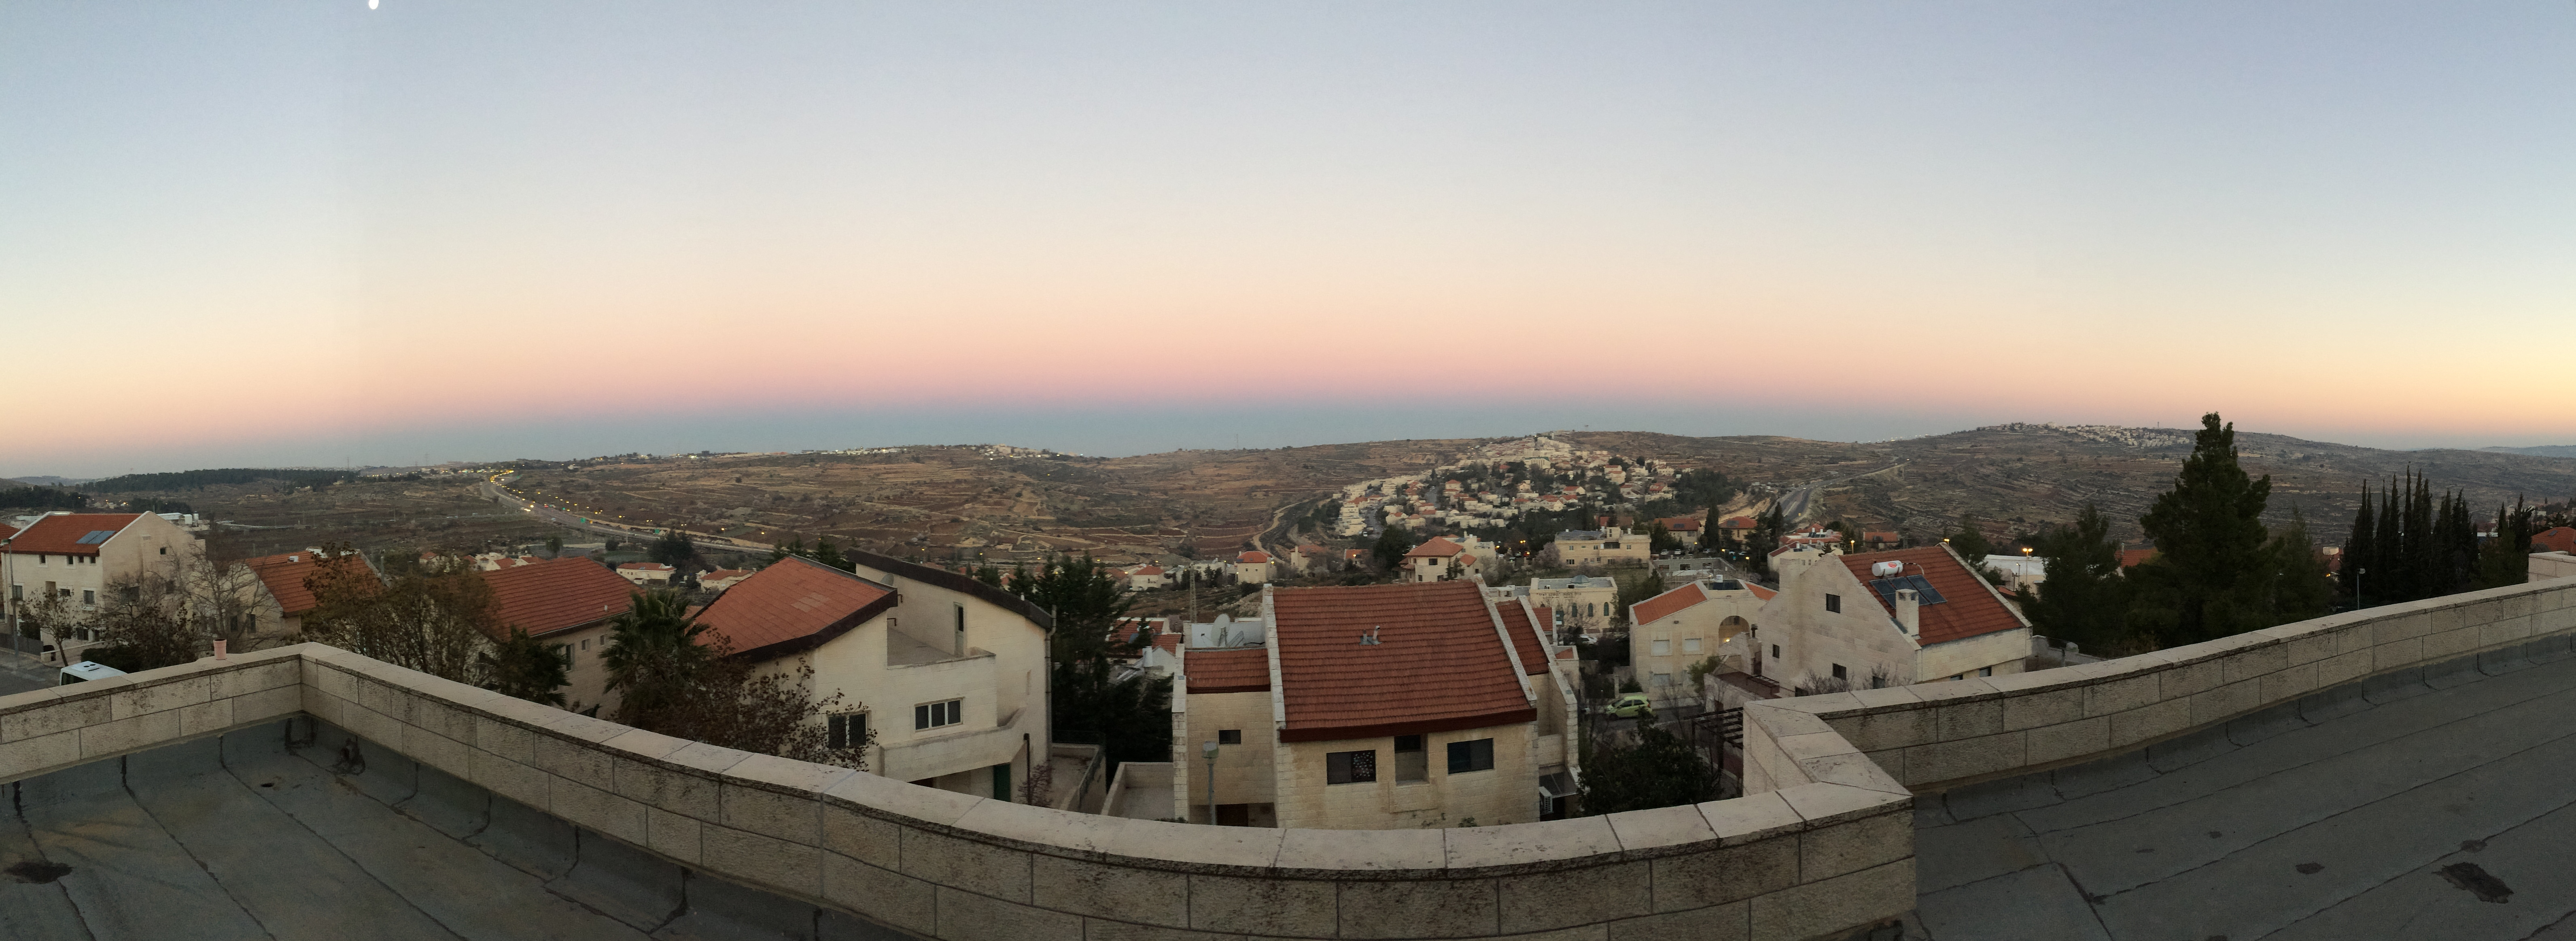 My Visit to Israel (Part 3)